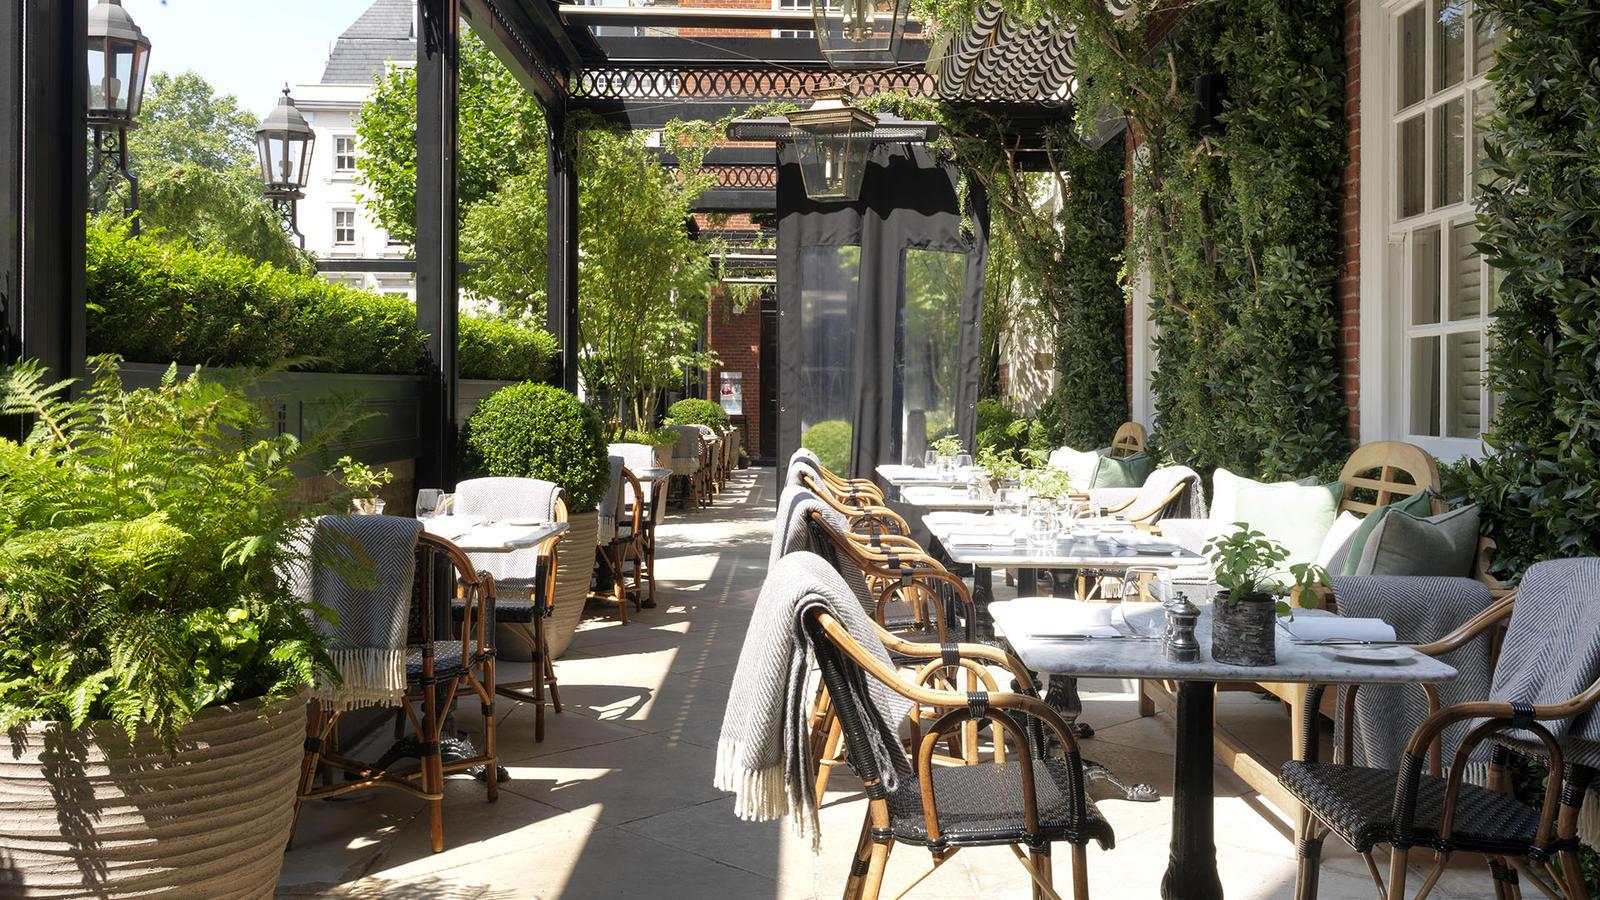 The bloomsbury hotel luxury hotel in london 39 s west end for Bloomsbury hotel terrace